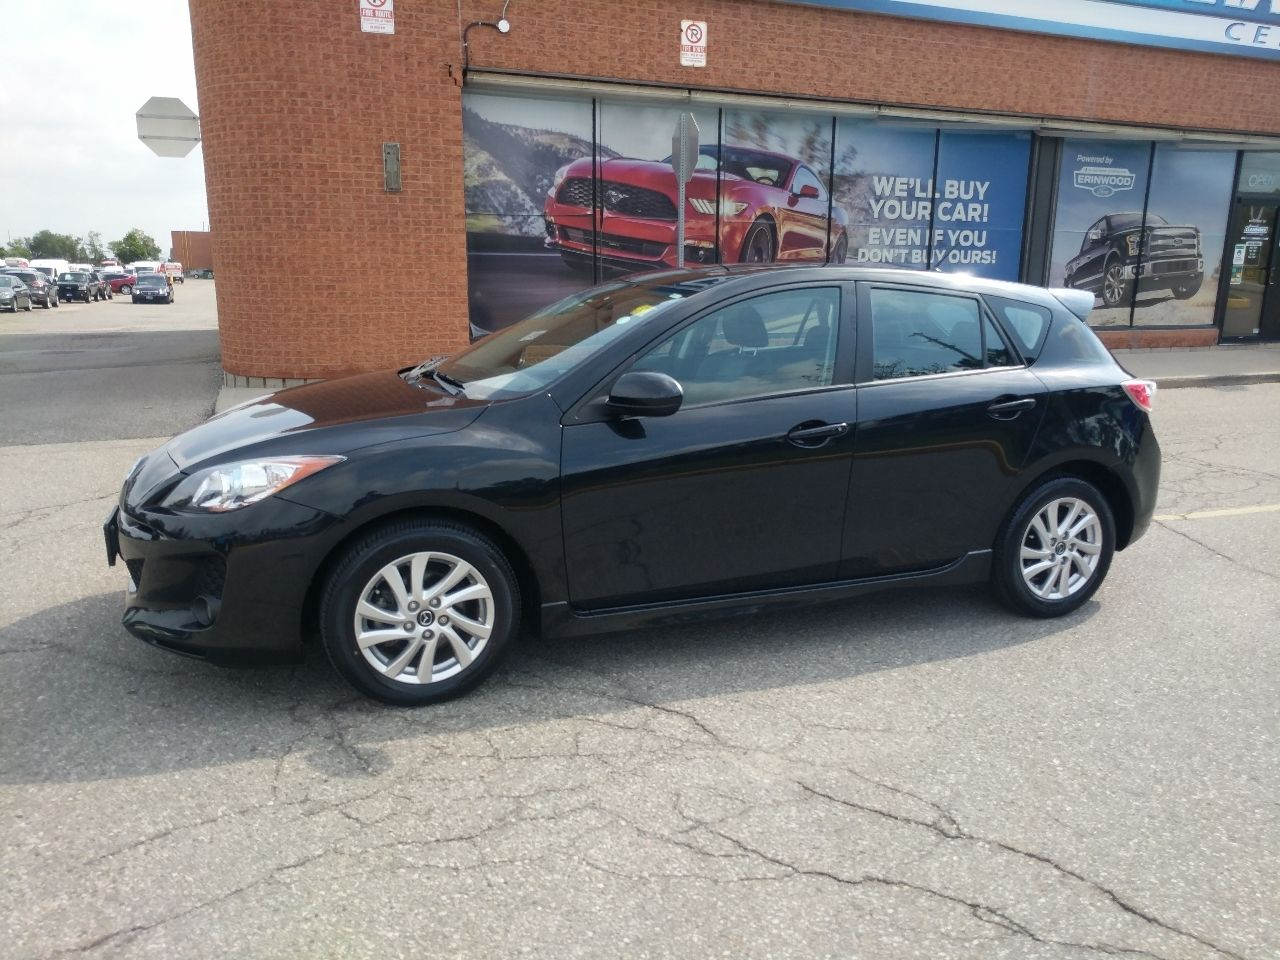 2013 Mazda 3 Image